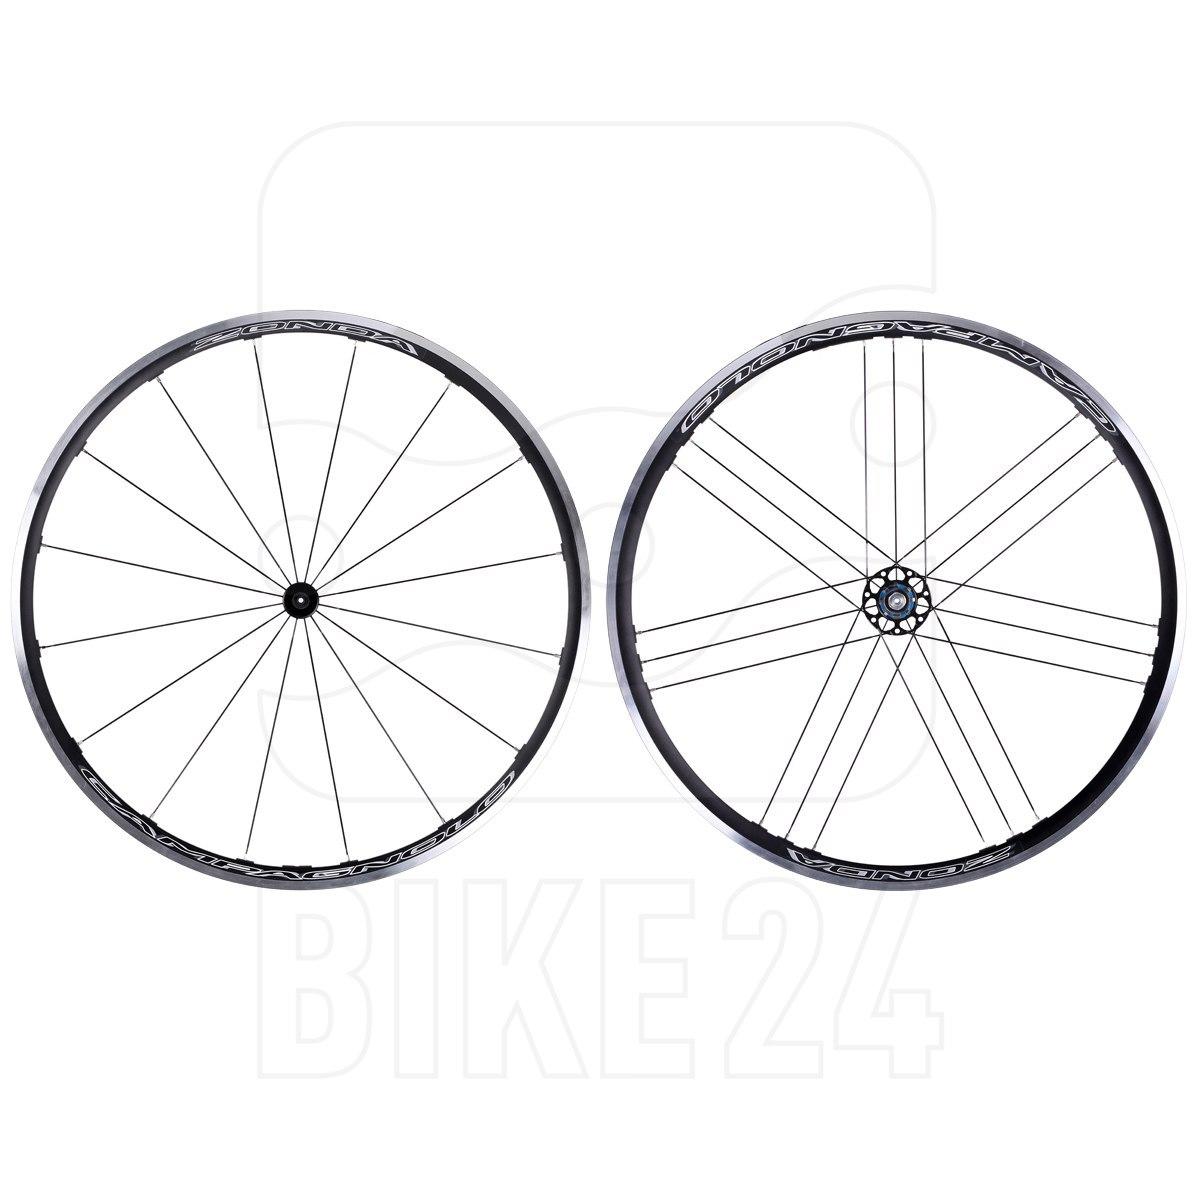 Campagnolo Zonda C17 Laufradsatz Drahtreifen